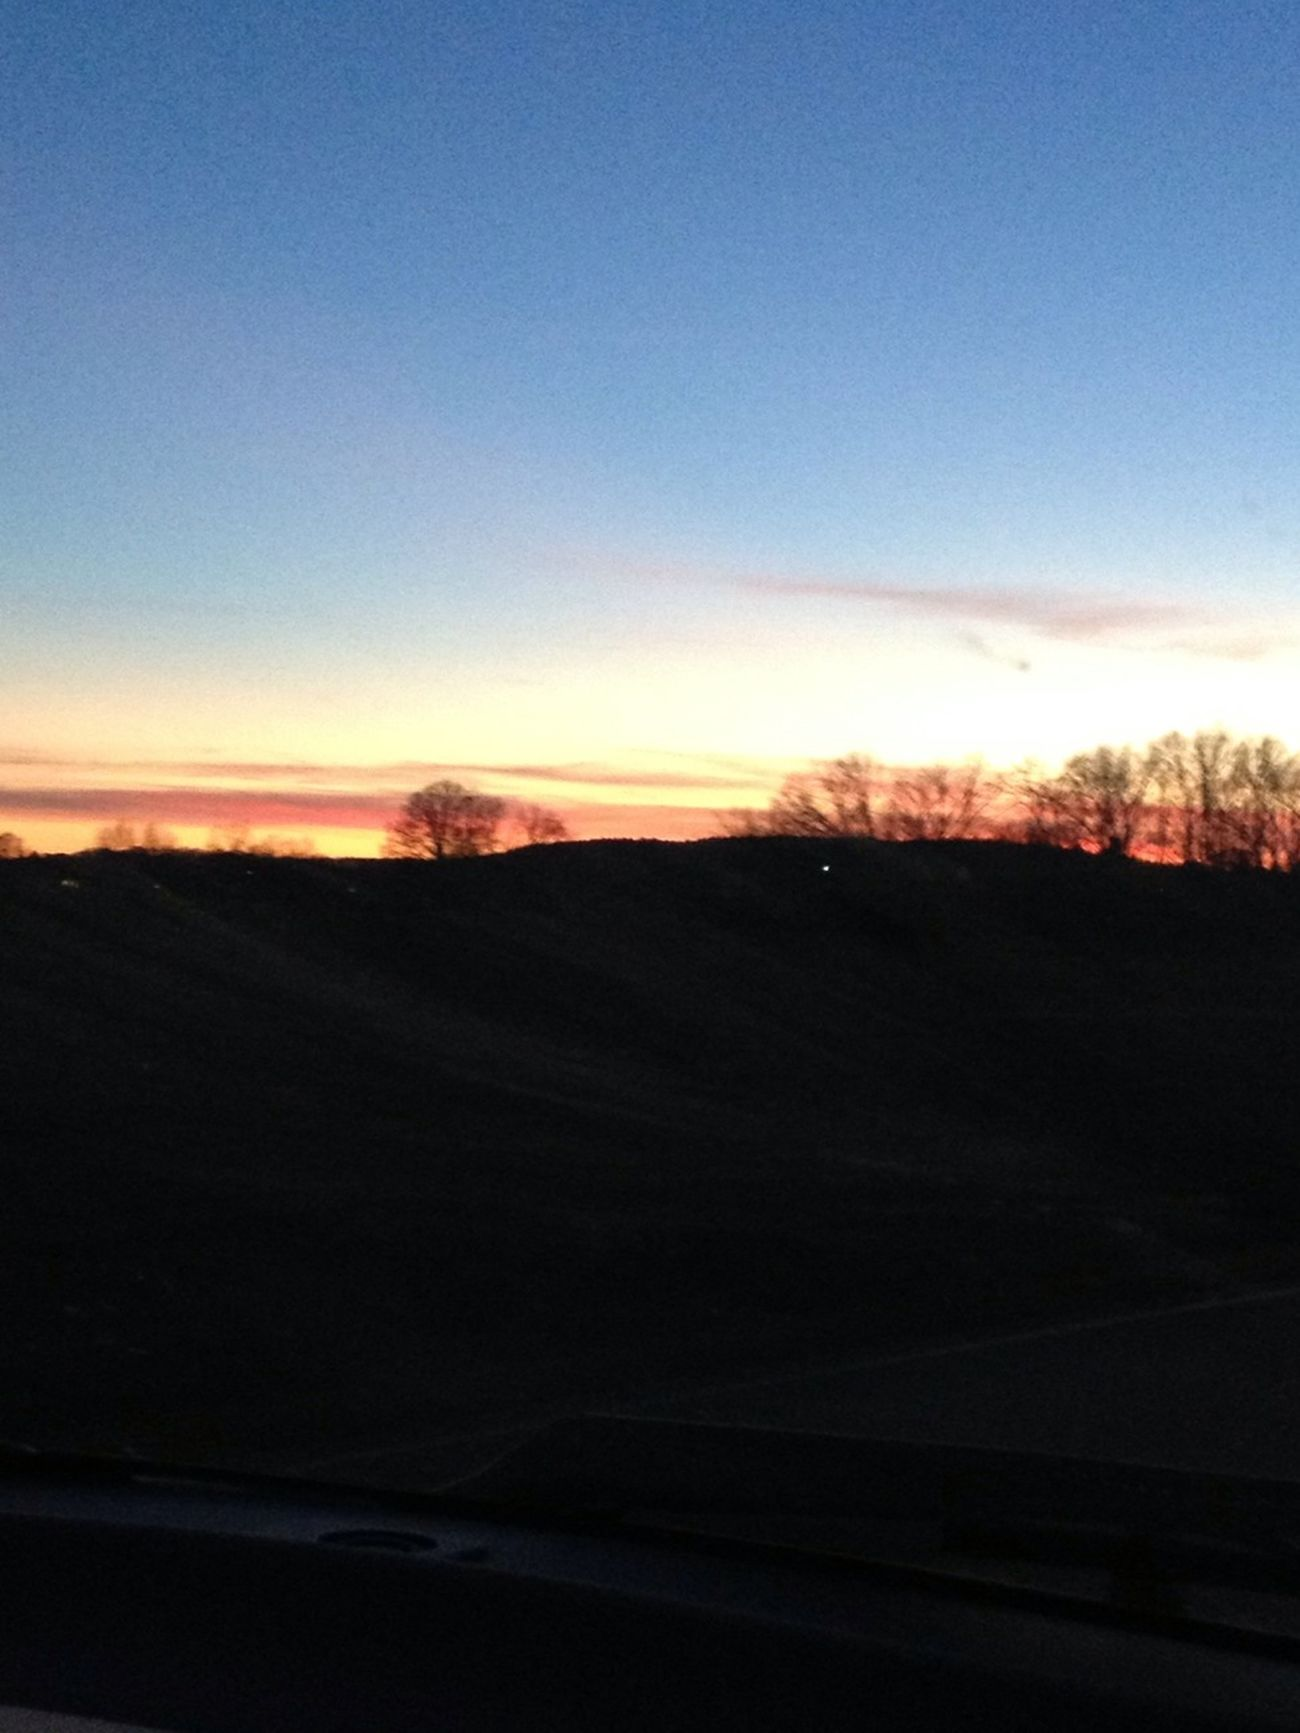 Simplicity/Sunset